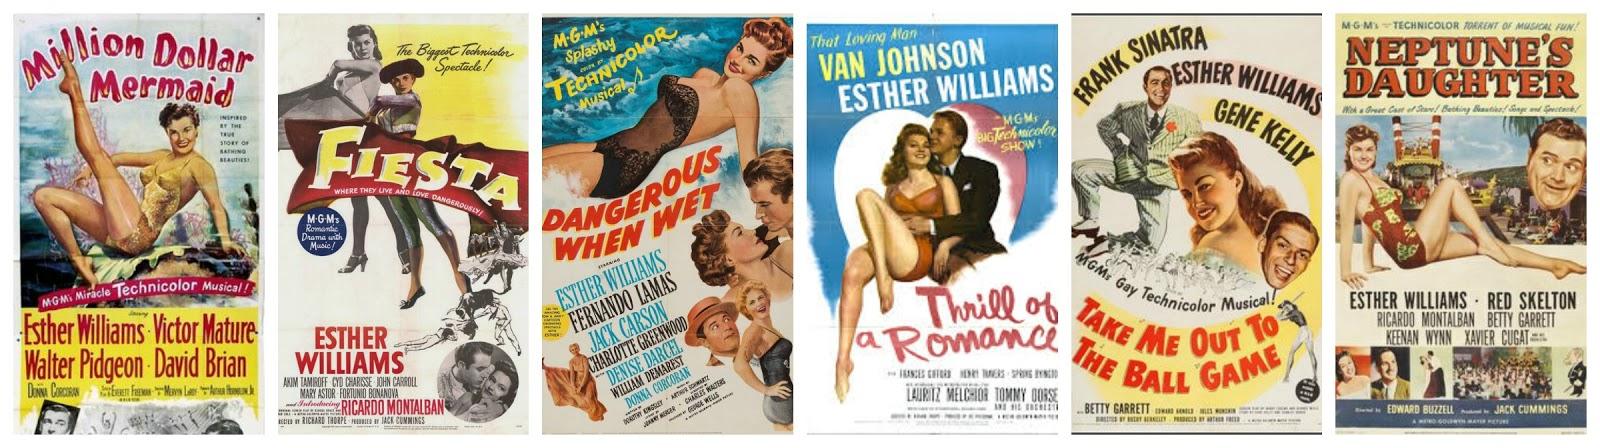 VARIE: Ritratti - Esther Williams, la Sirena di Hollywood - Blog ...